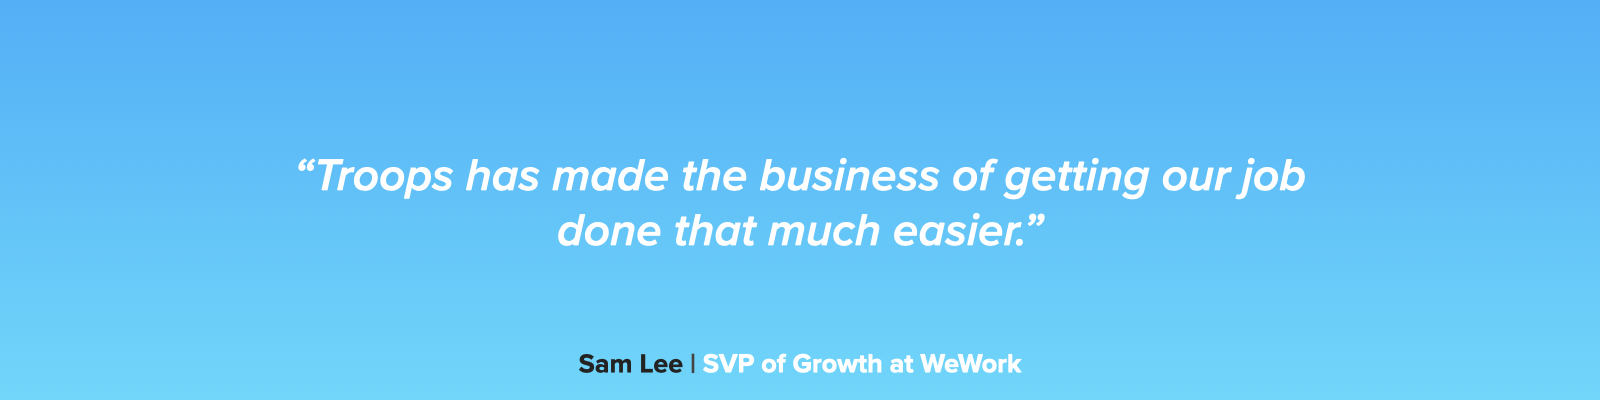 WeWork Quote #5.001